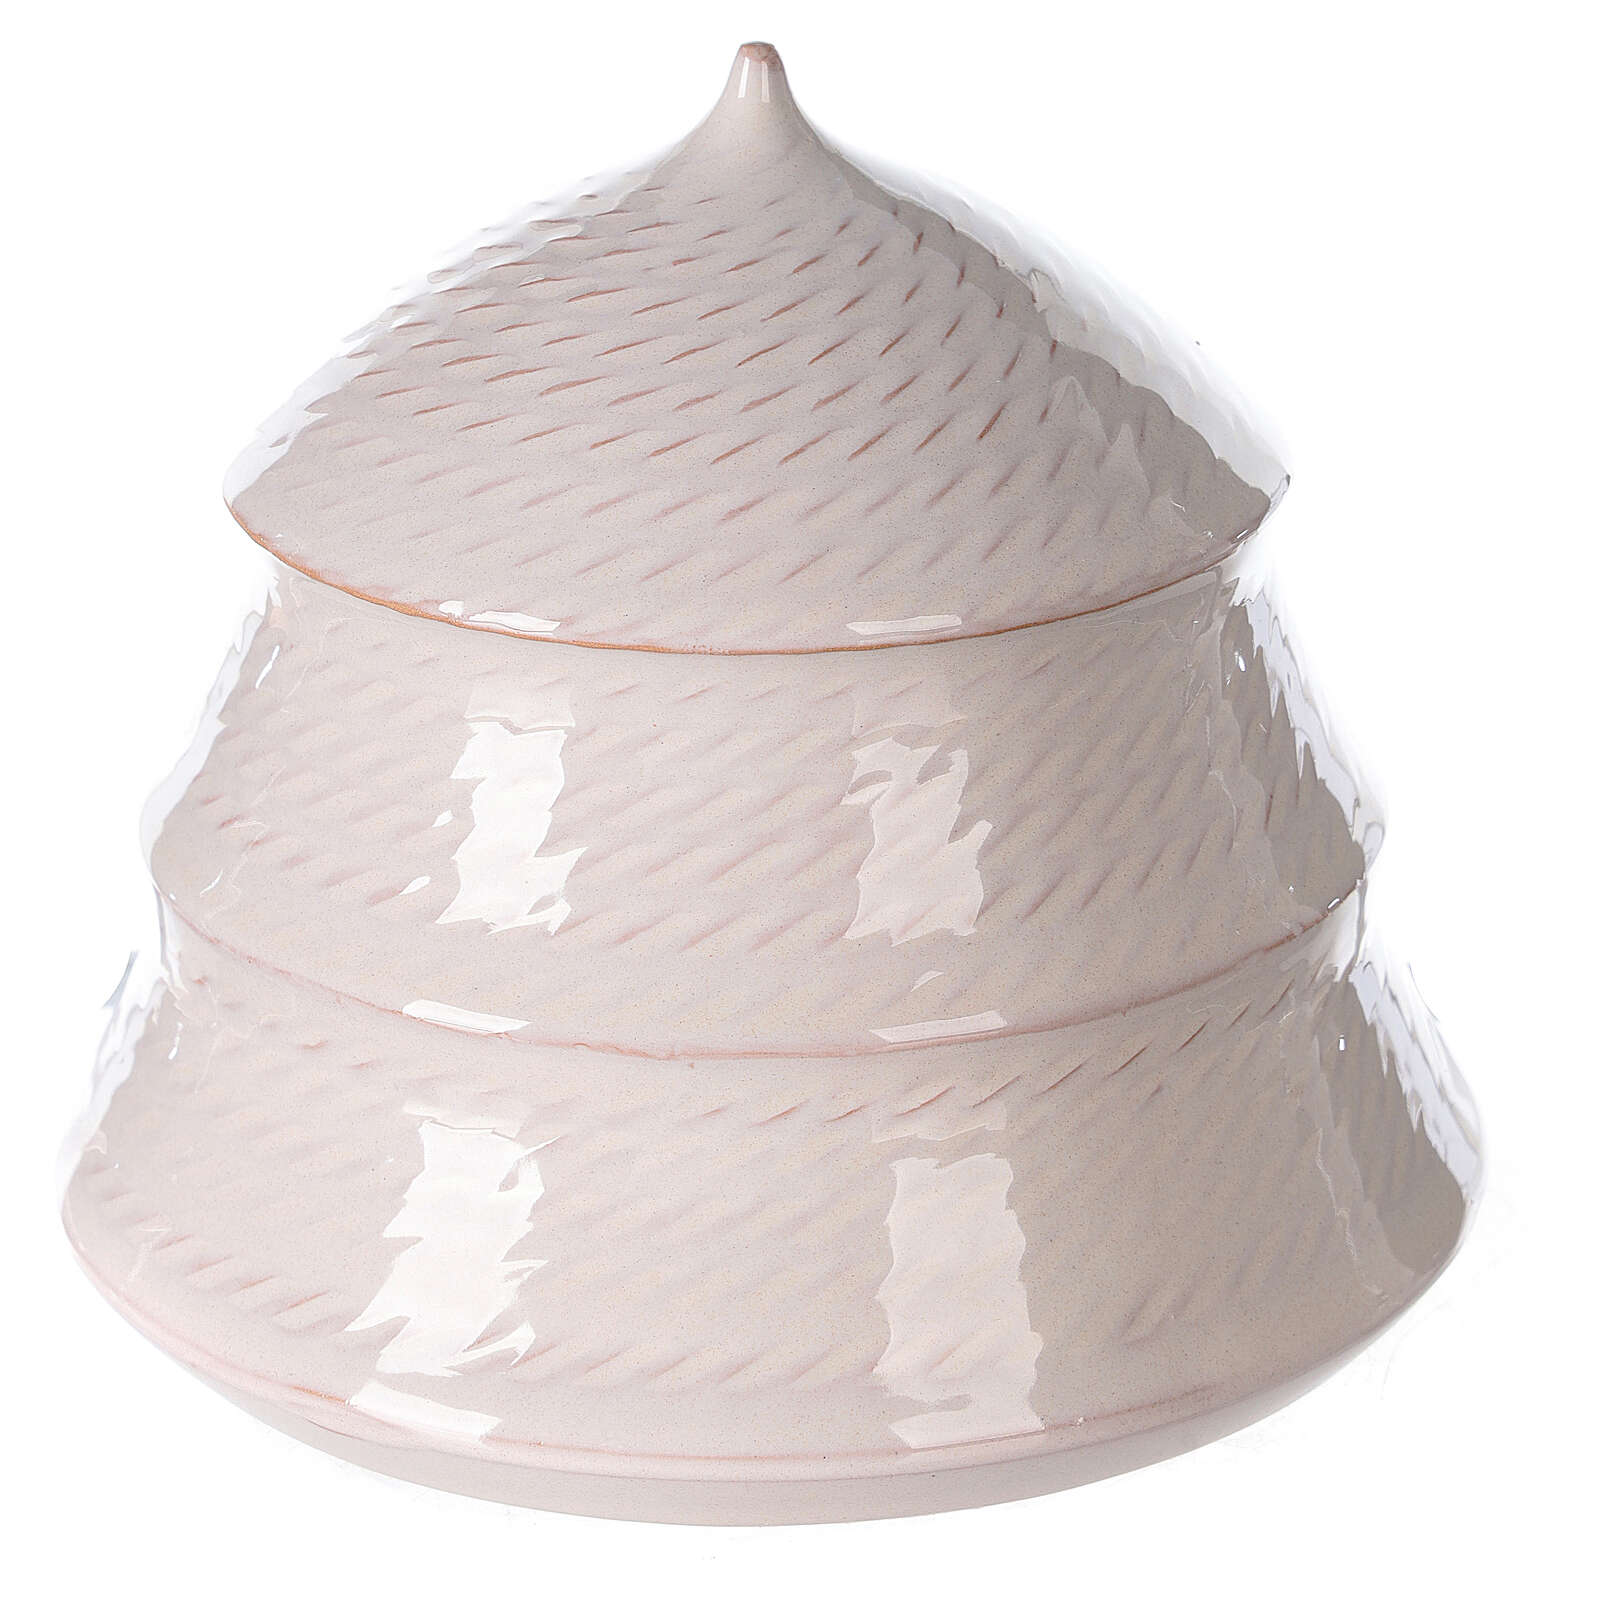 Pino bianco aperto Natività terracotta bianca Deruta 12 cm 4